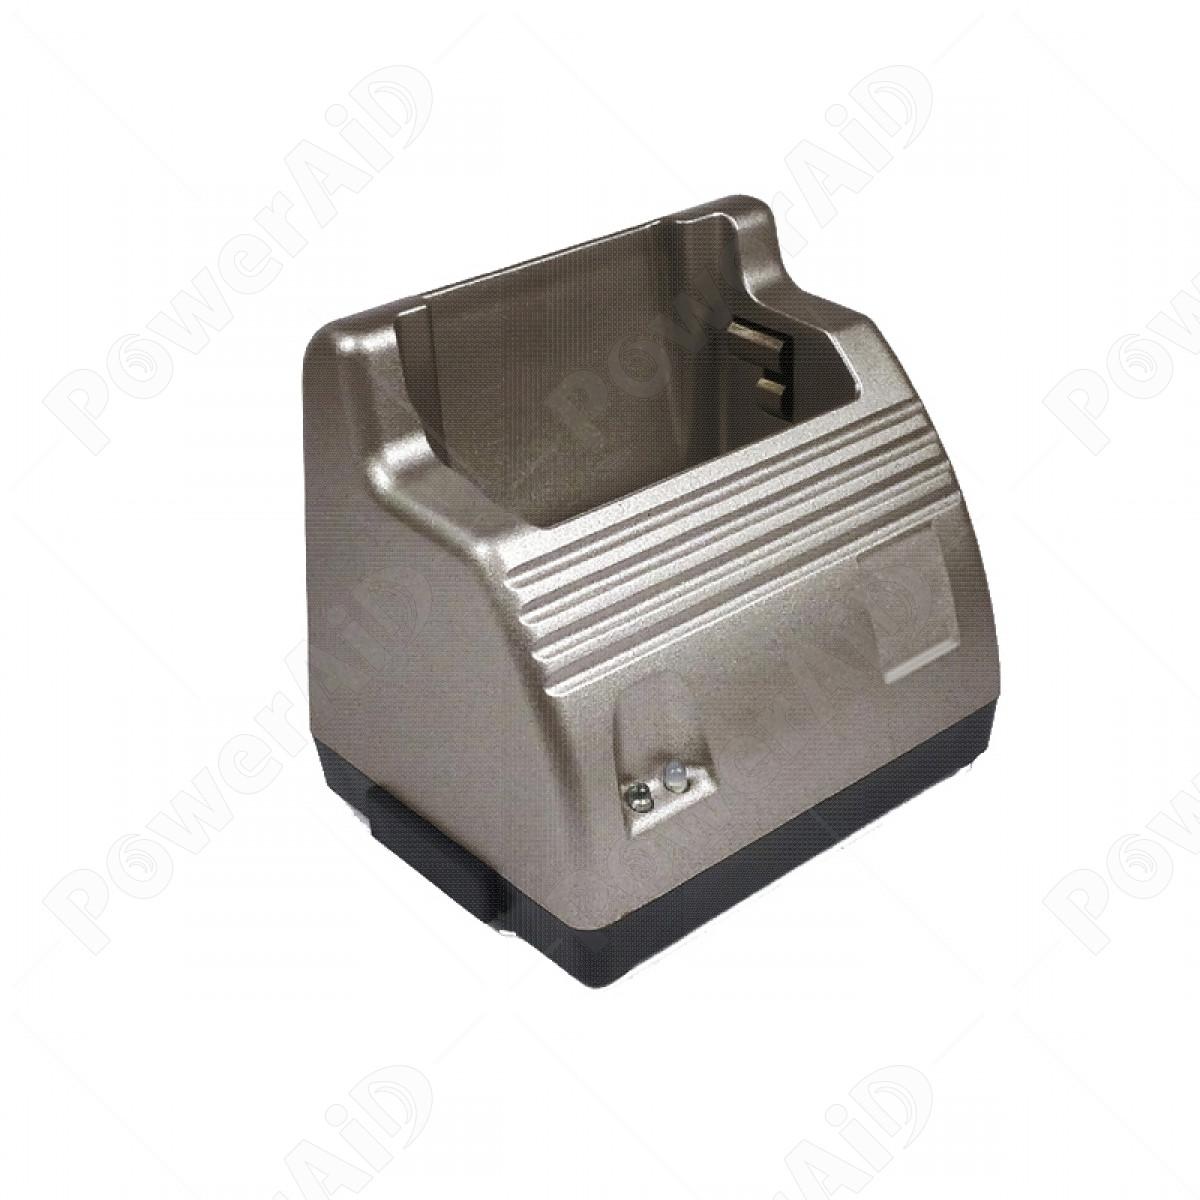 Humantechnik - Caricatore per Ricevitore portatile Signolux